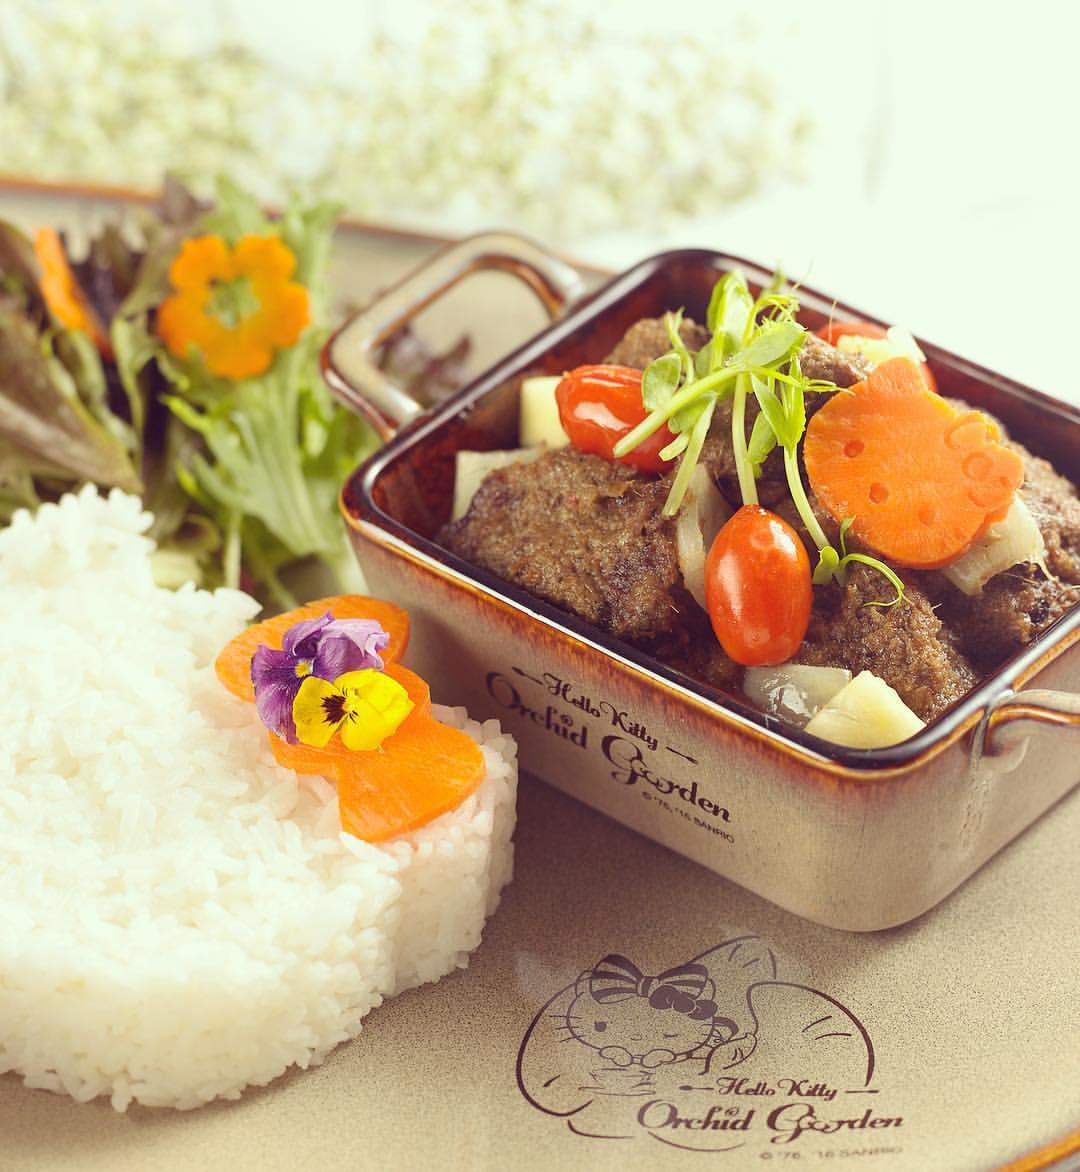 quán cafe ở singapore: thức ăn tại hello kitty orchid garden